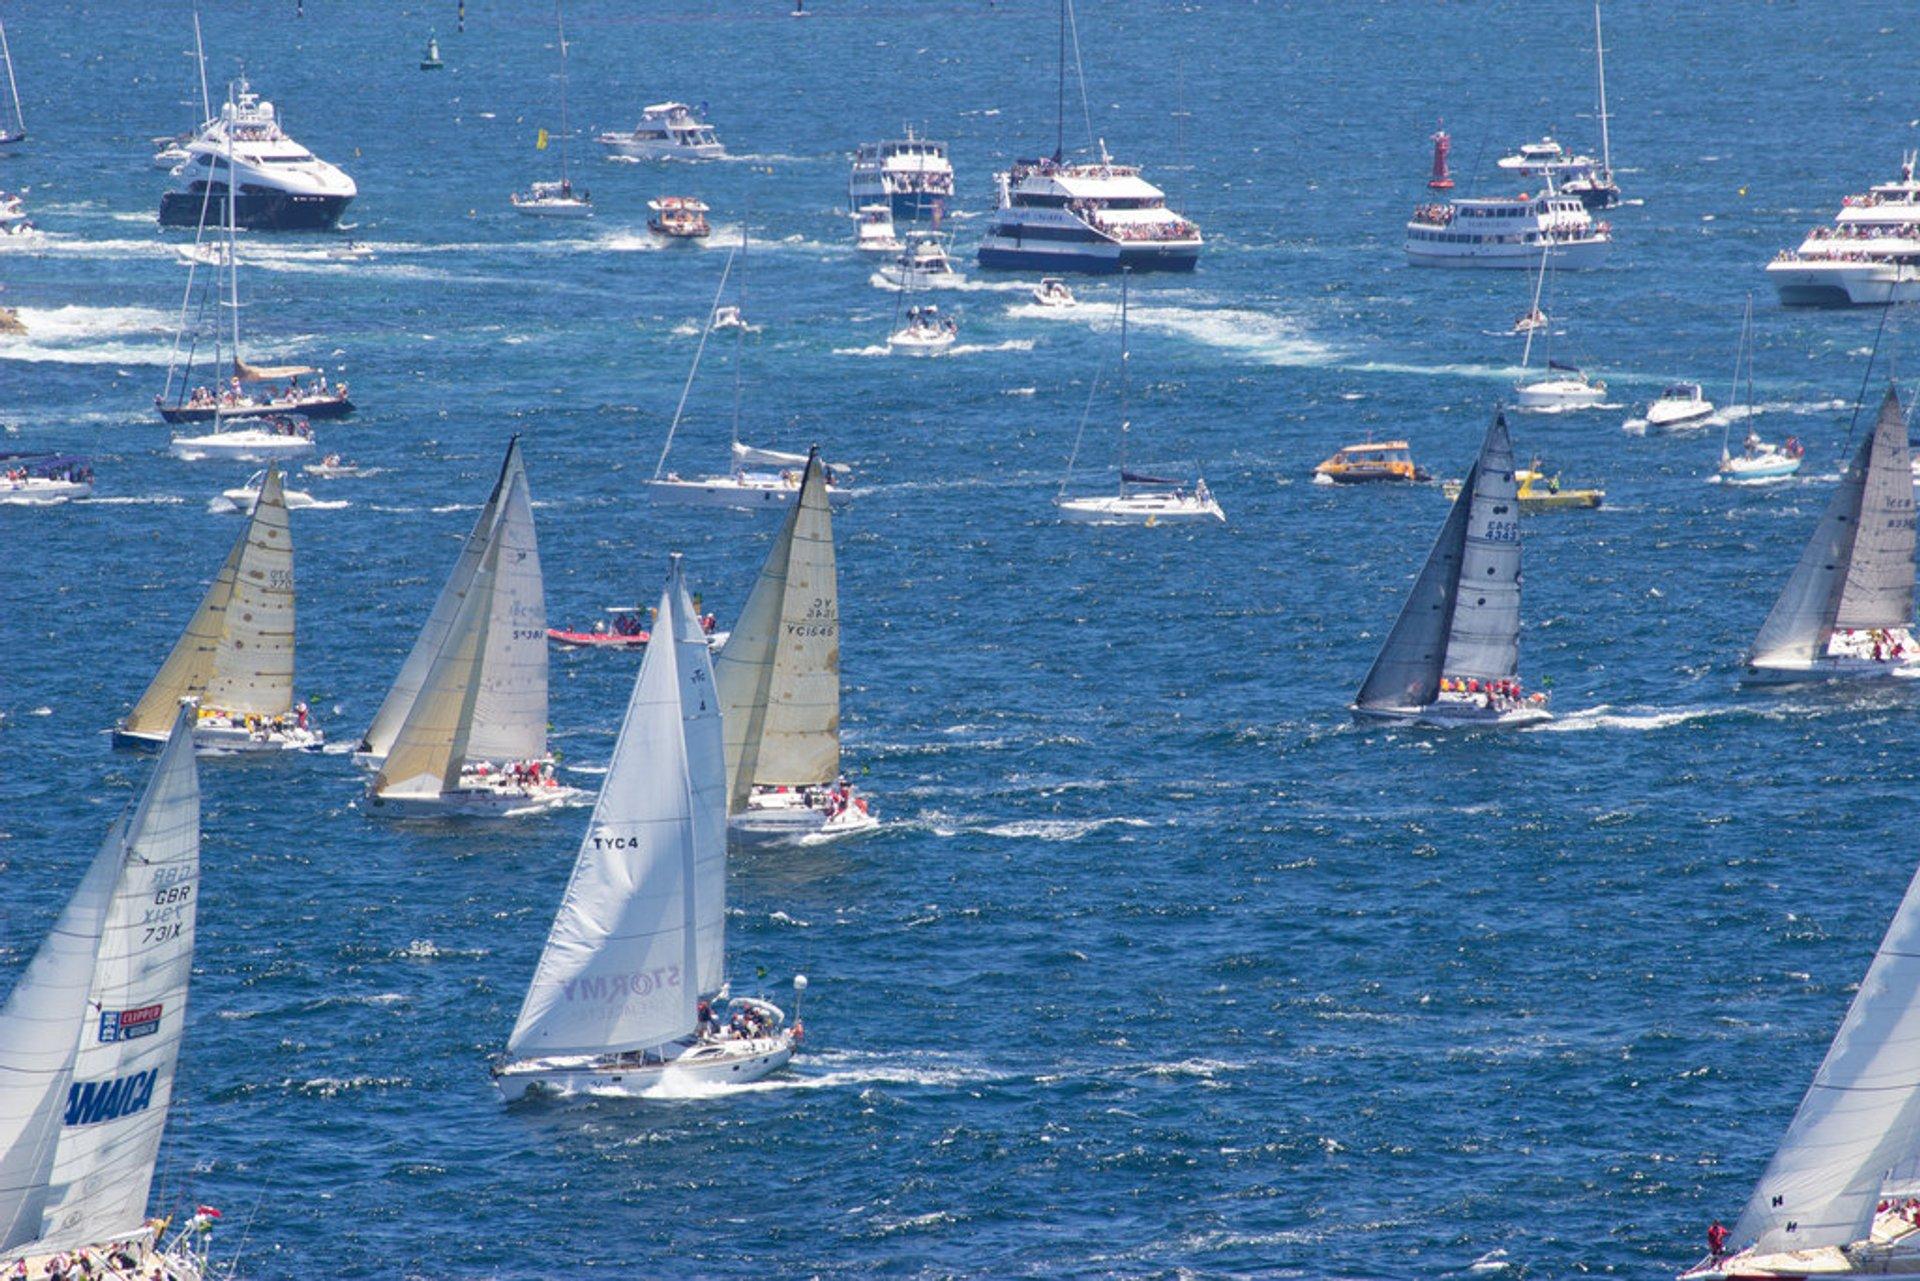 Sydney Hobart Yacht Race 2019